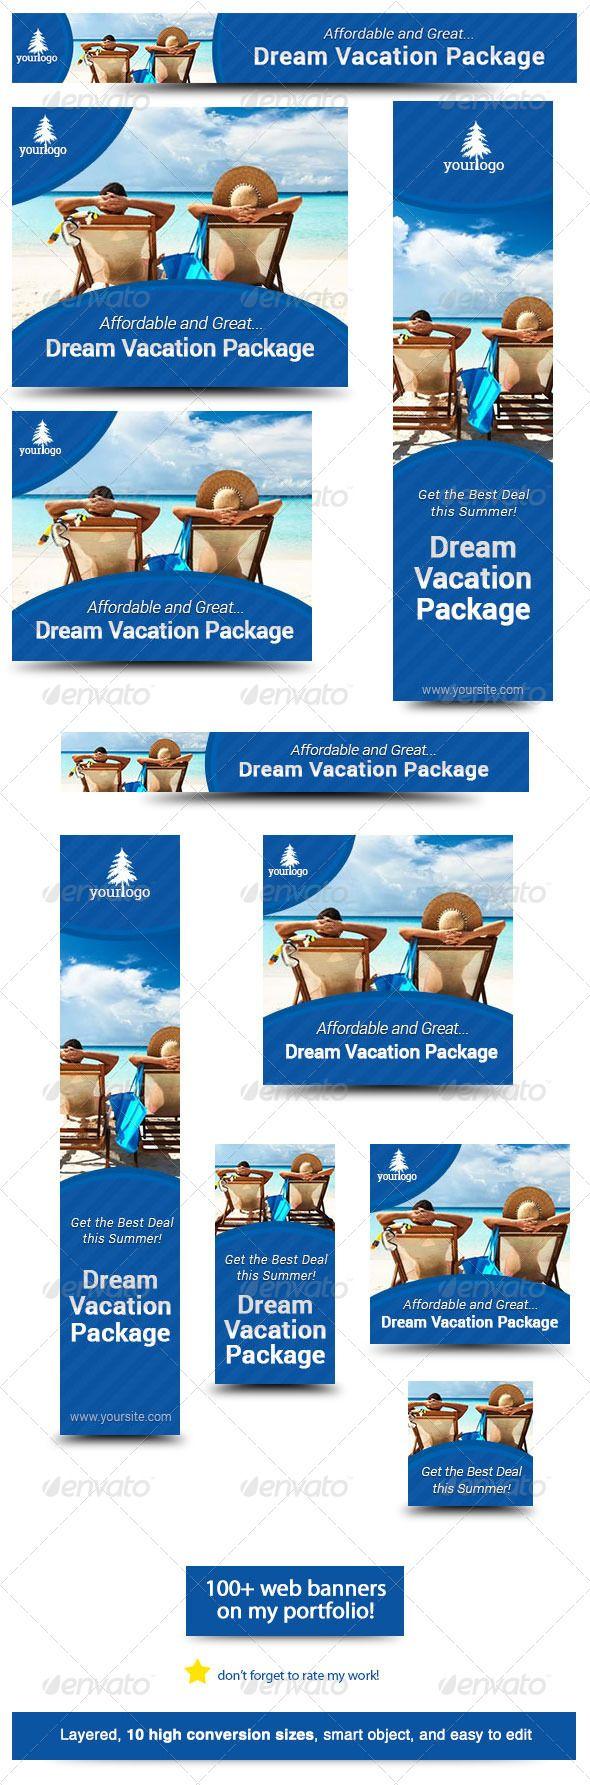 Banner design for job fair - Dream Vacation Web Banner Design